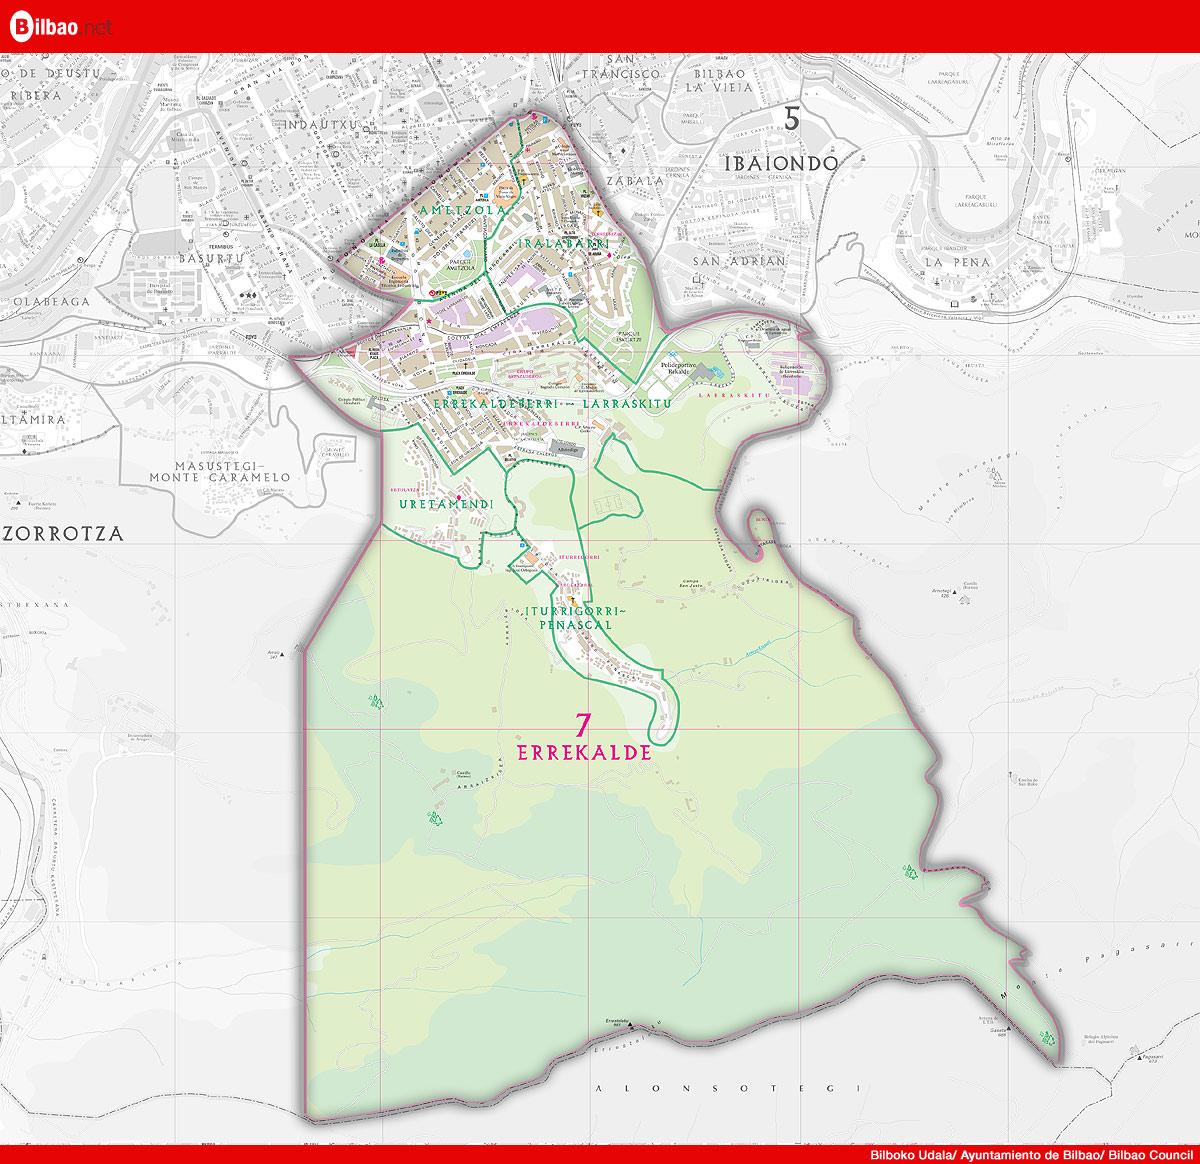 Recalde district